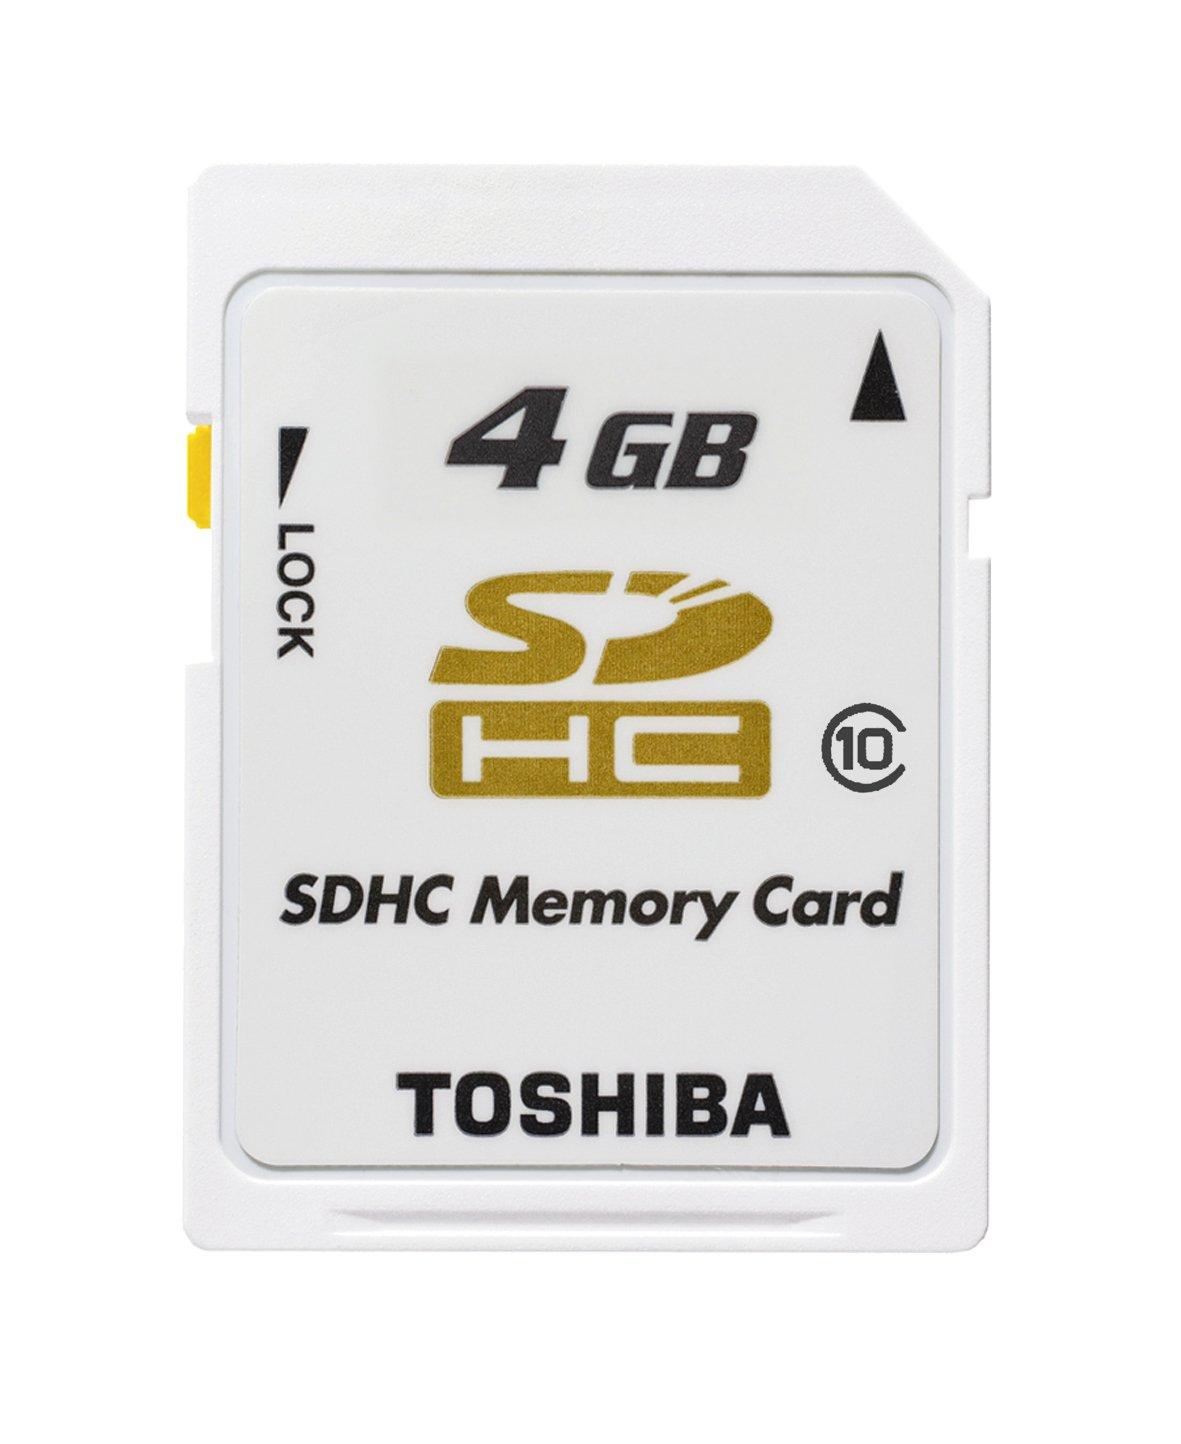 Toshiba SD-T04GJ (BL5) - Tarjeta de memoria SDHC 4 GB, class 10, color blanco